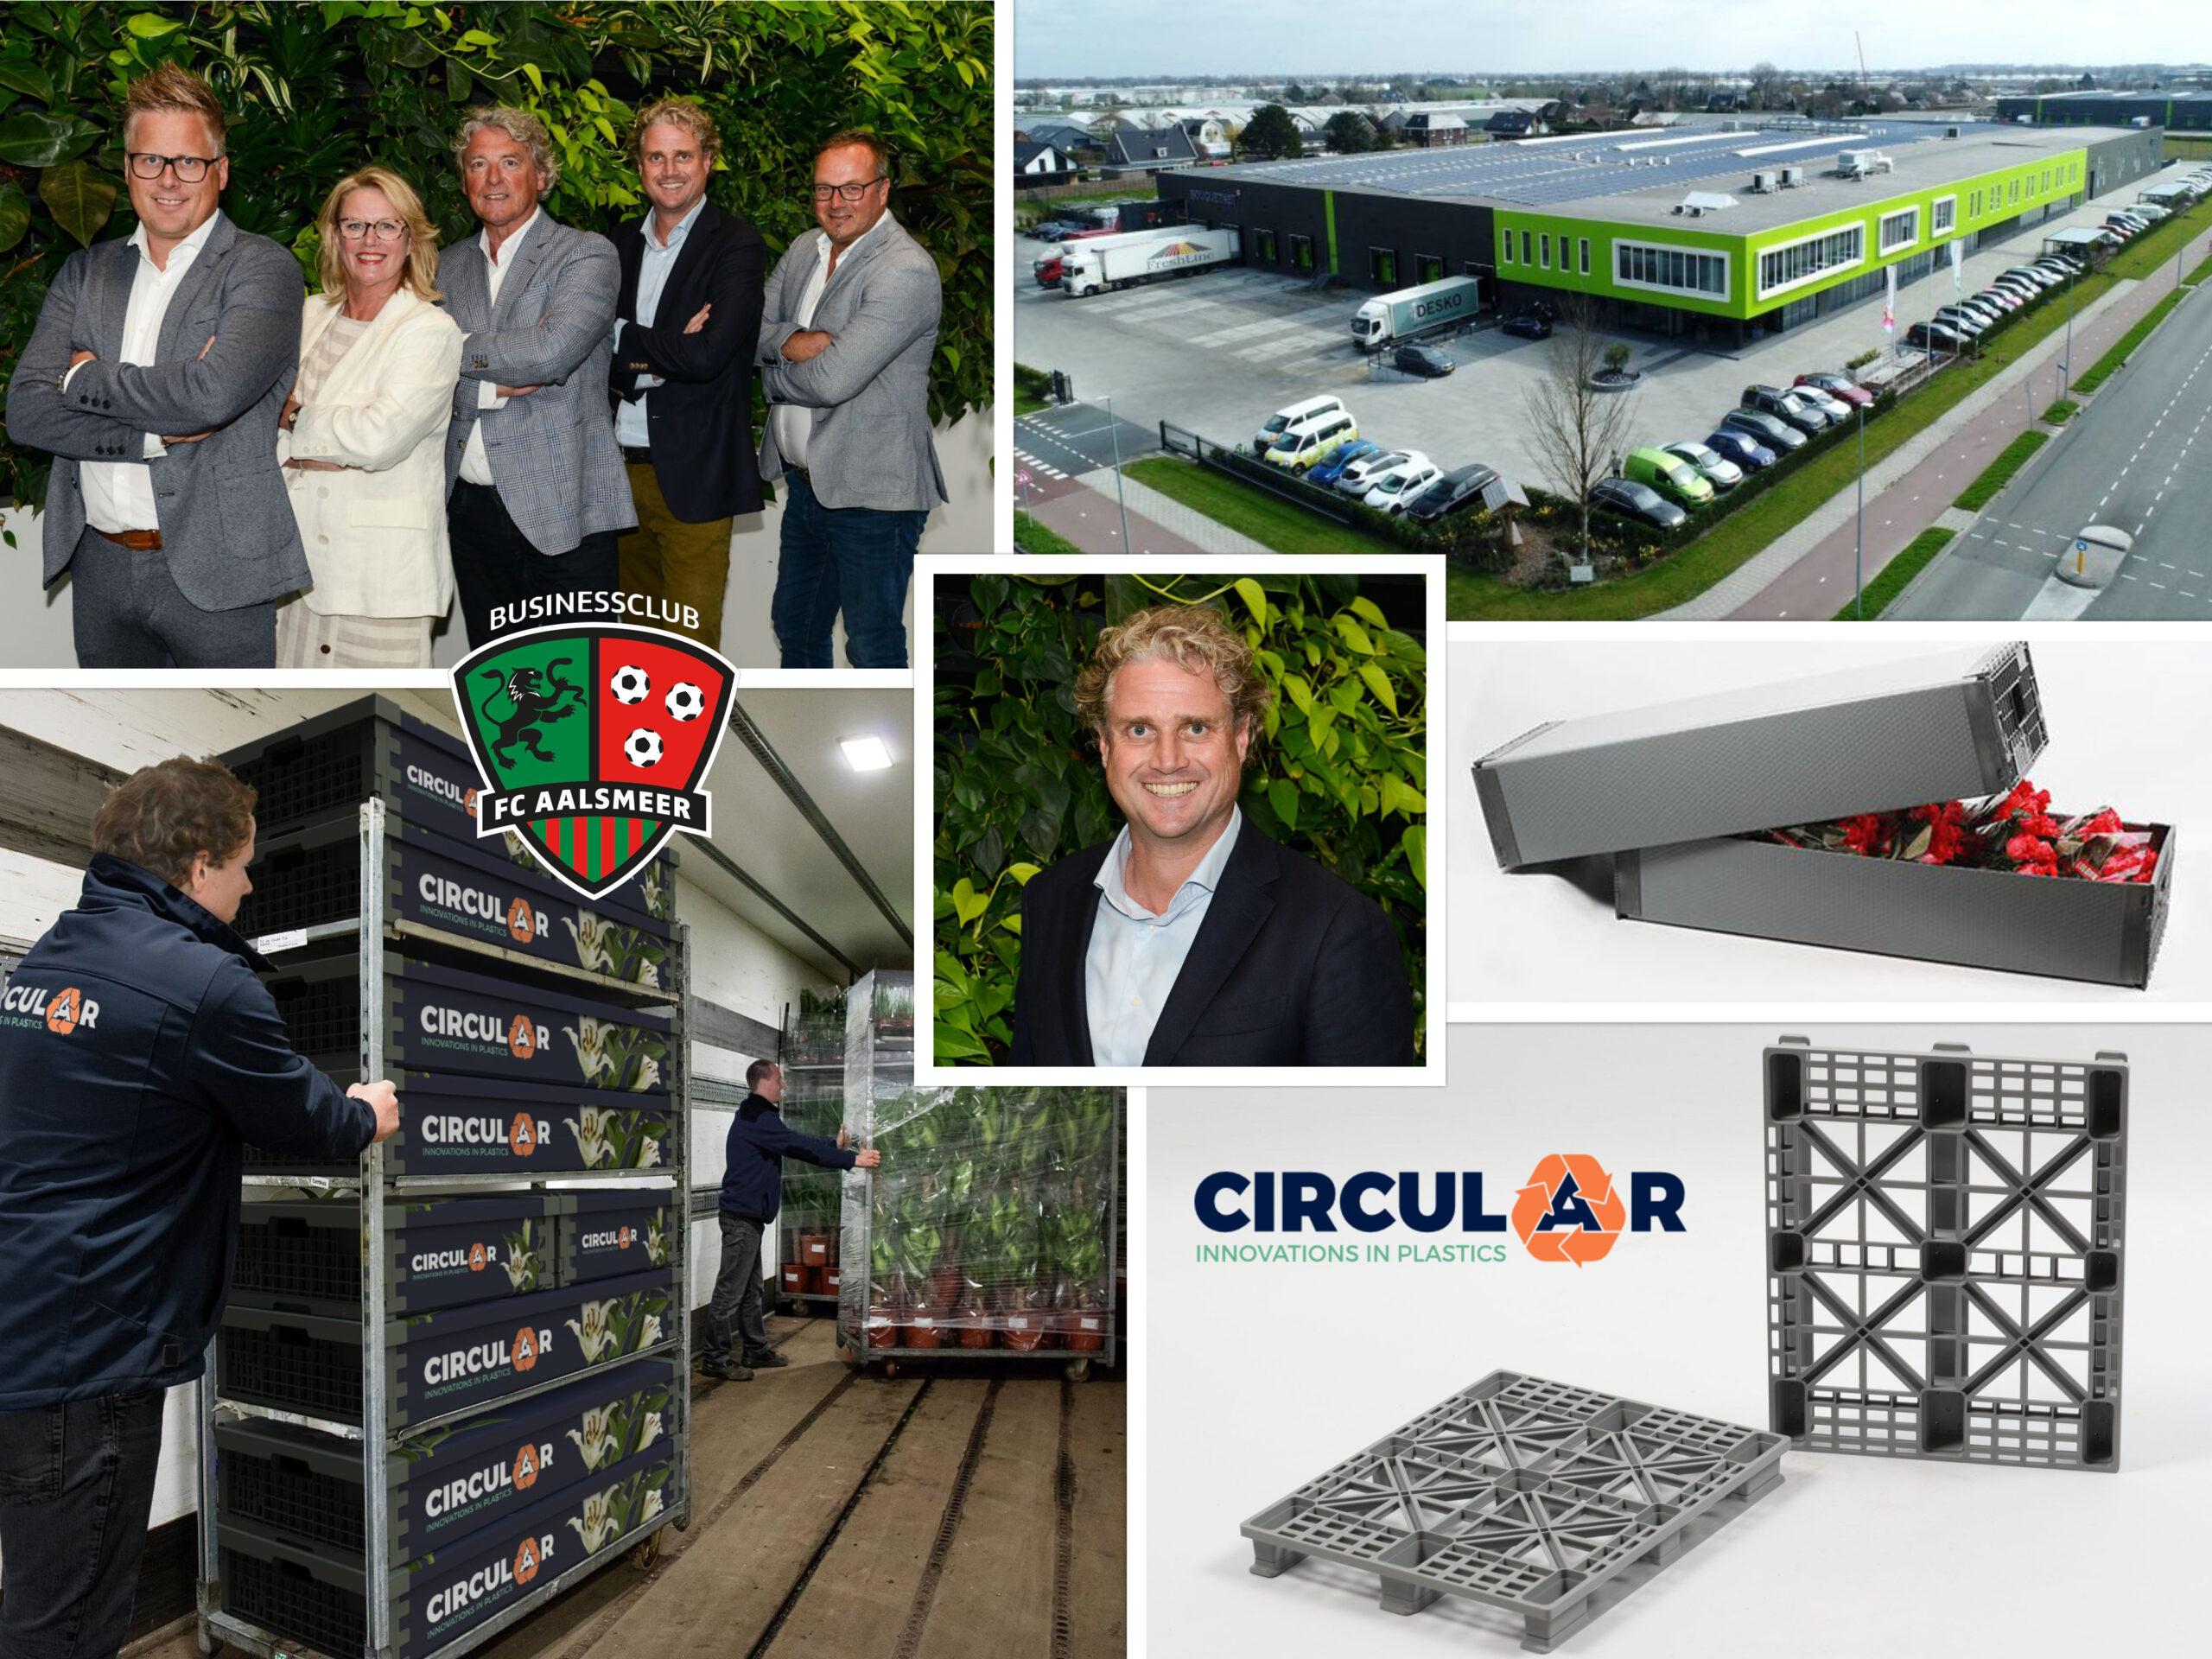 Circular Plastics-businessclub-fcaalsmeer